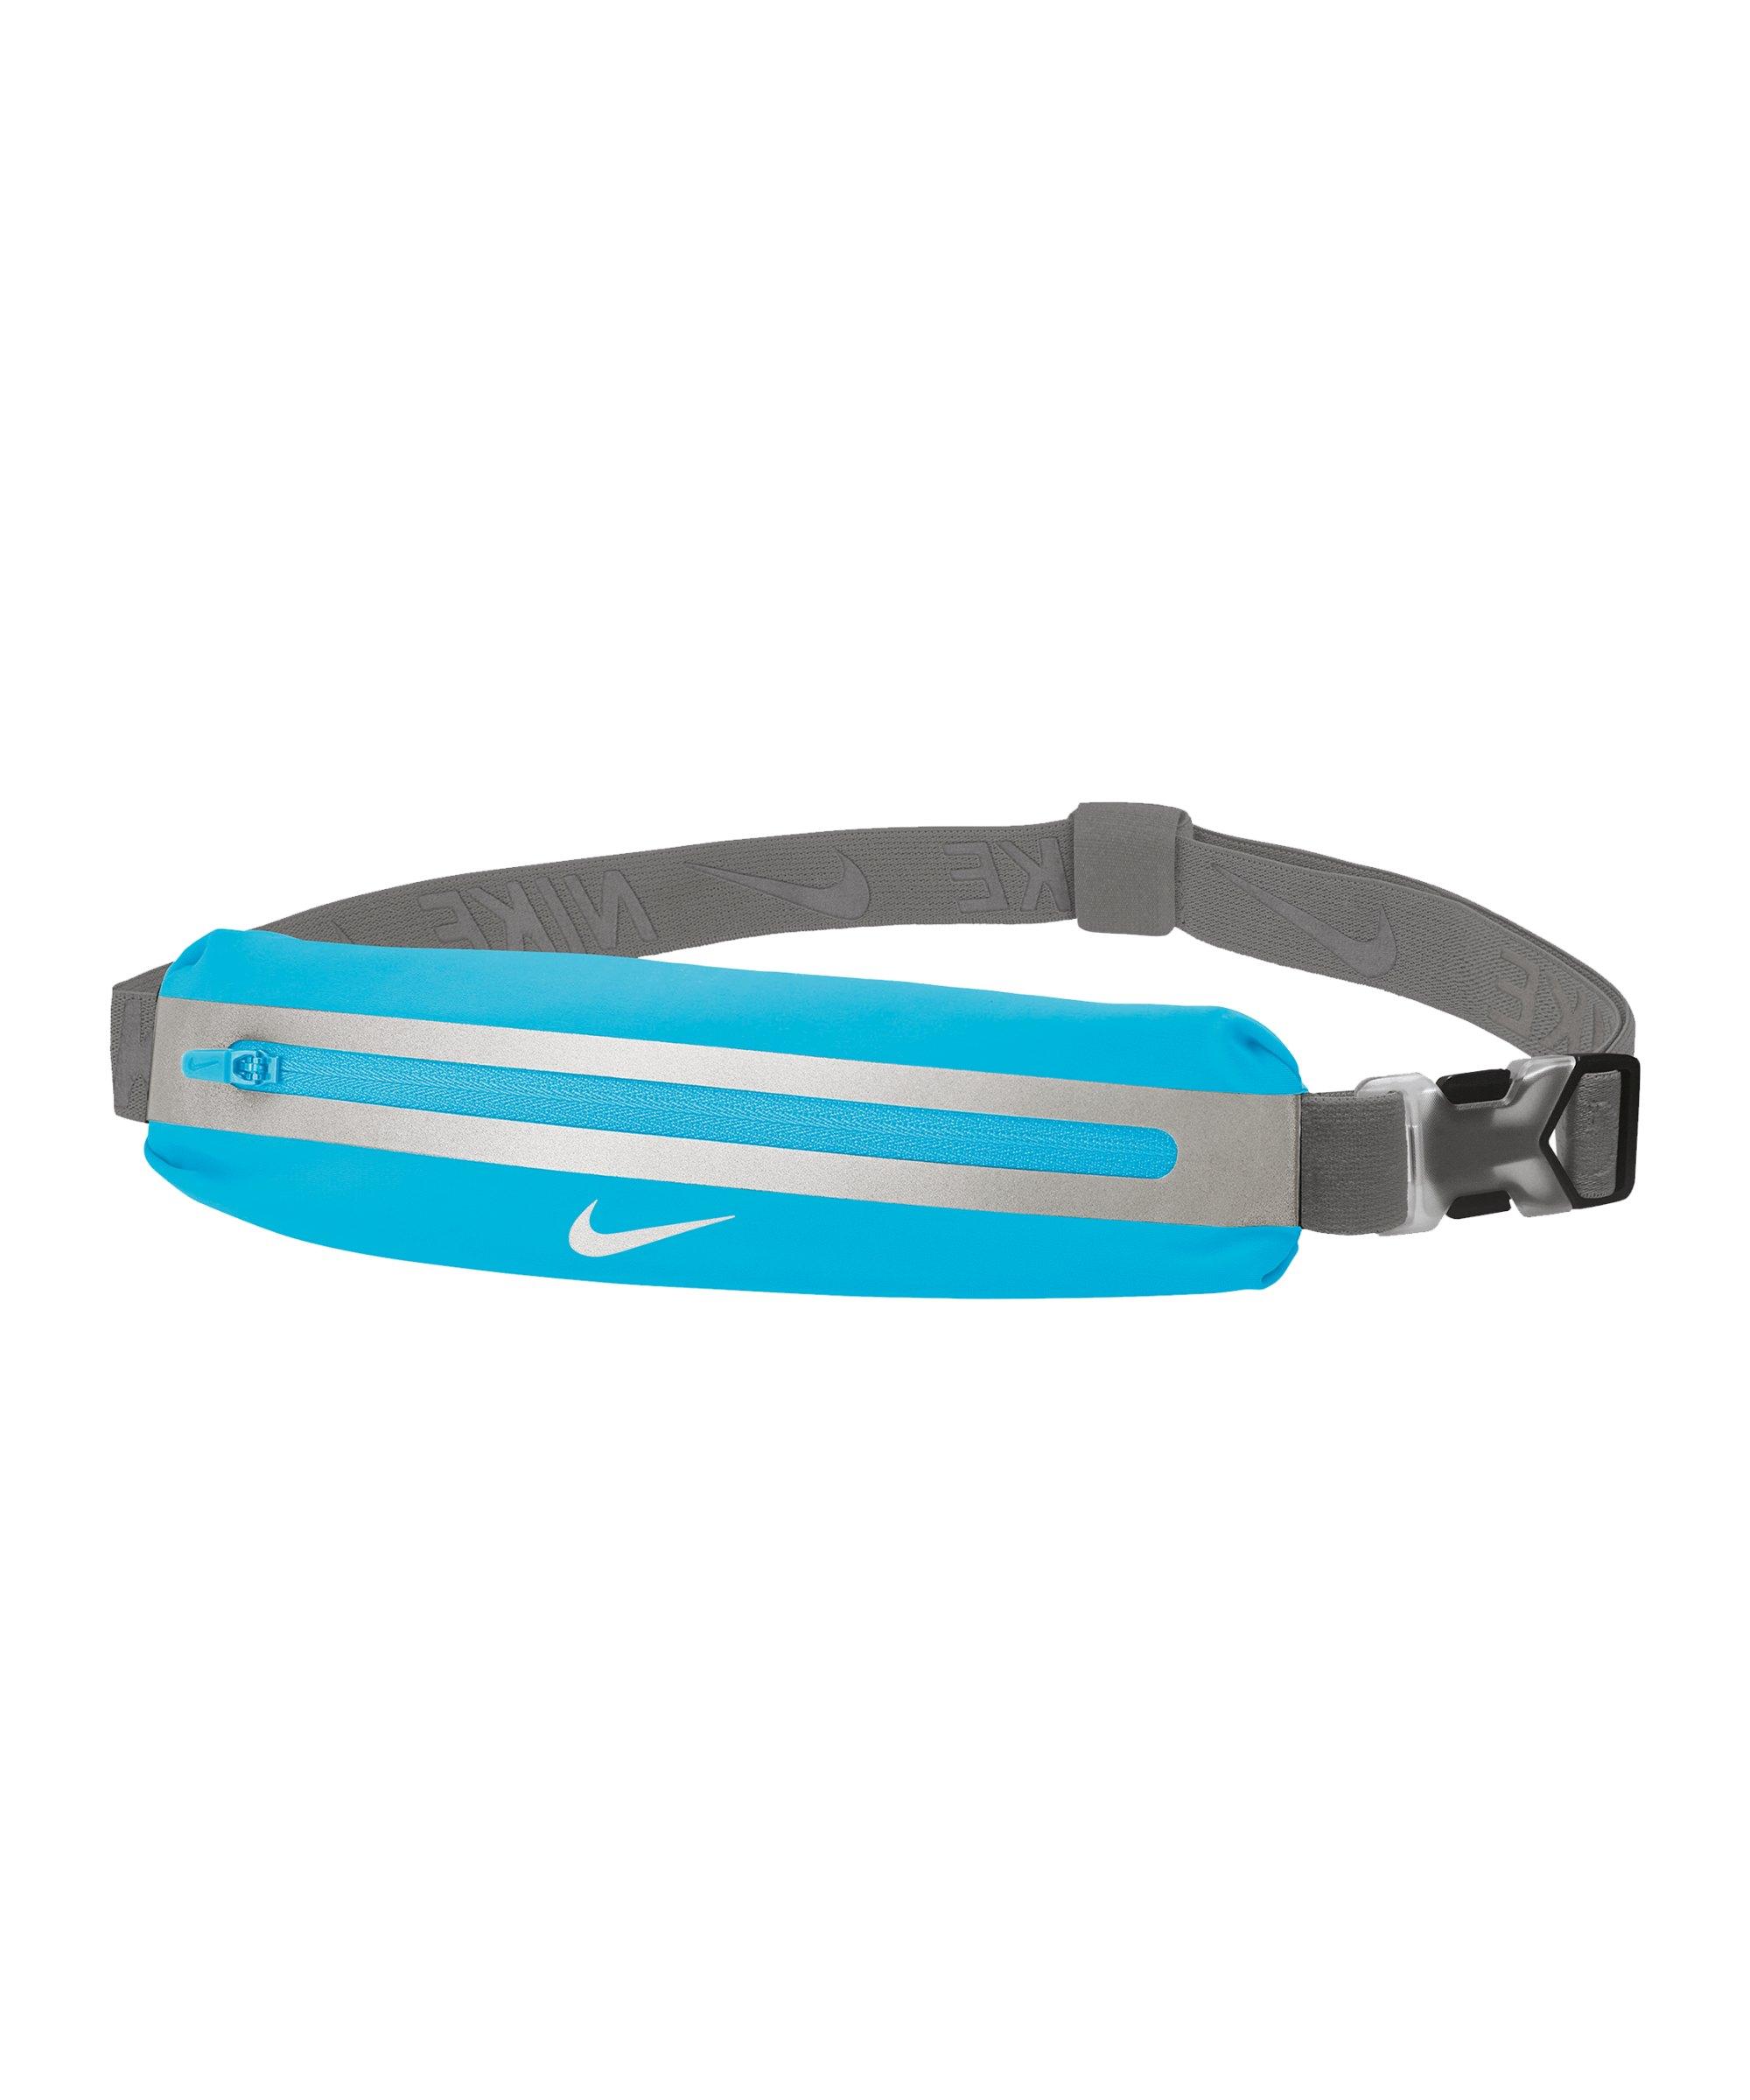 Nike Slim Waistpack 2.0 Hüfttasche Blau Grau F449 - blau